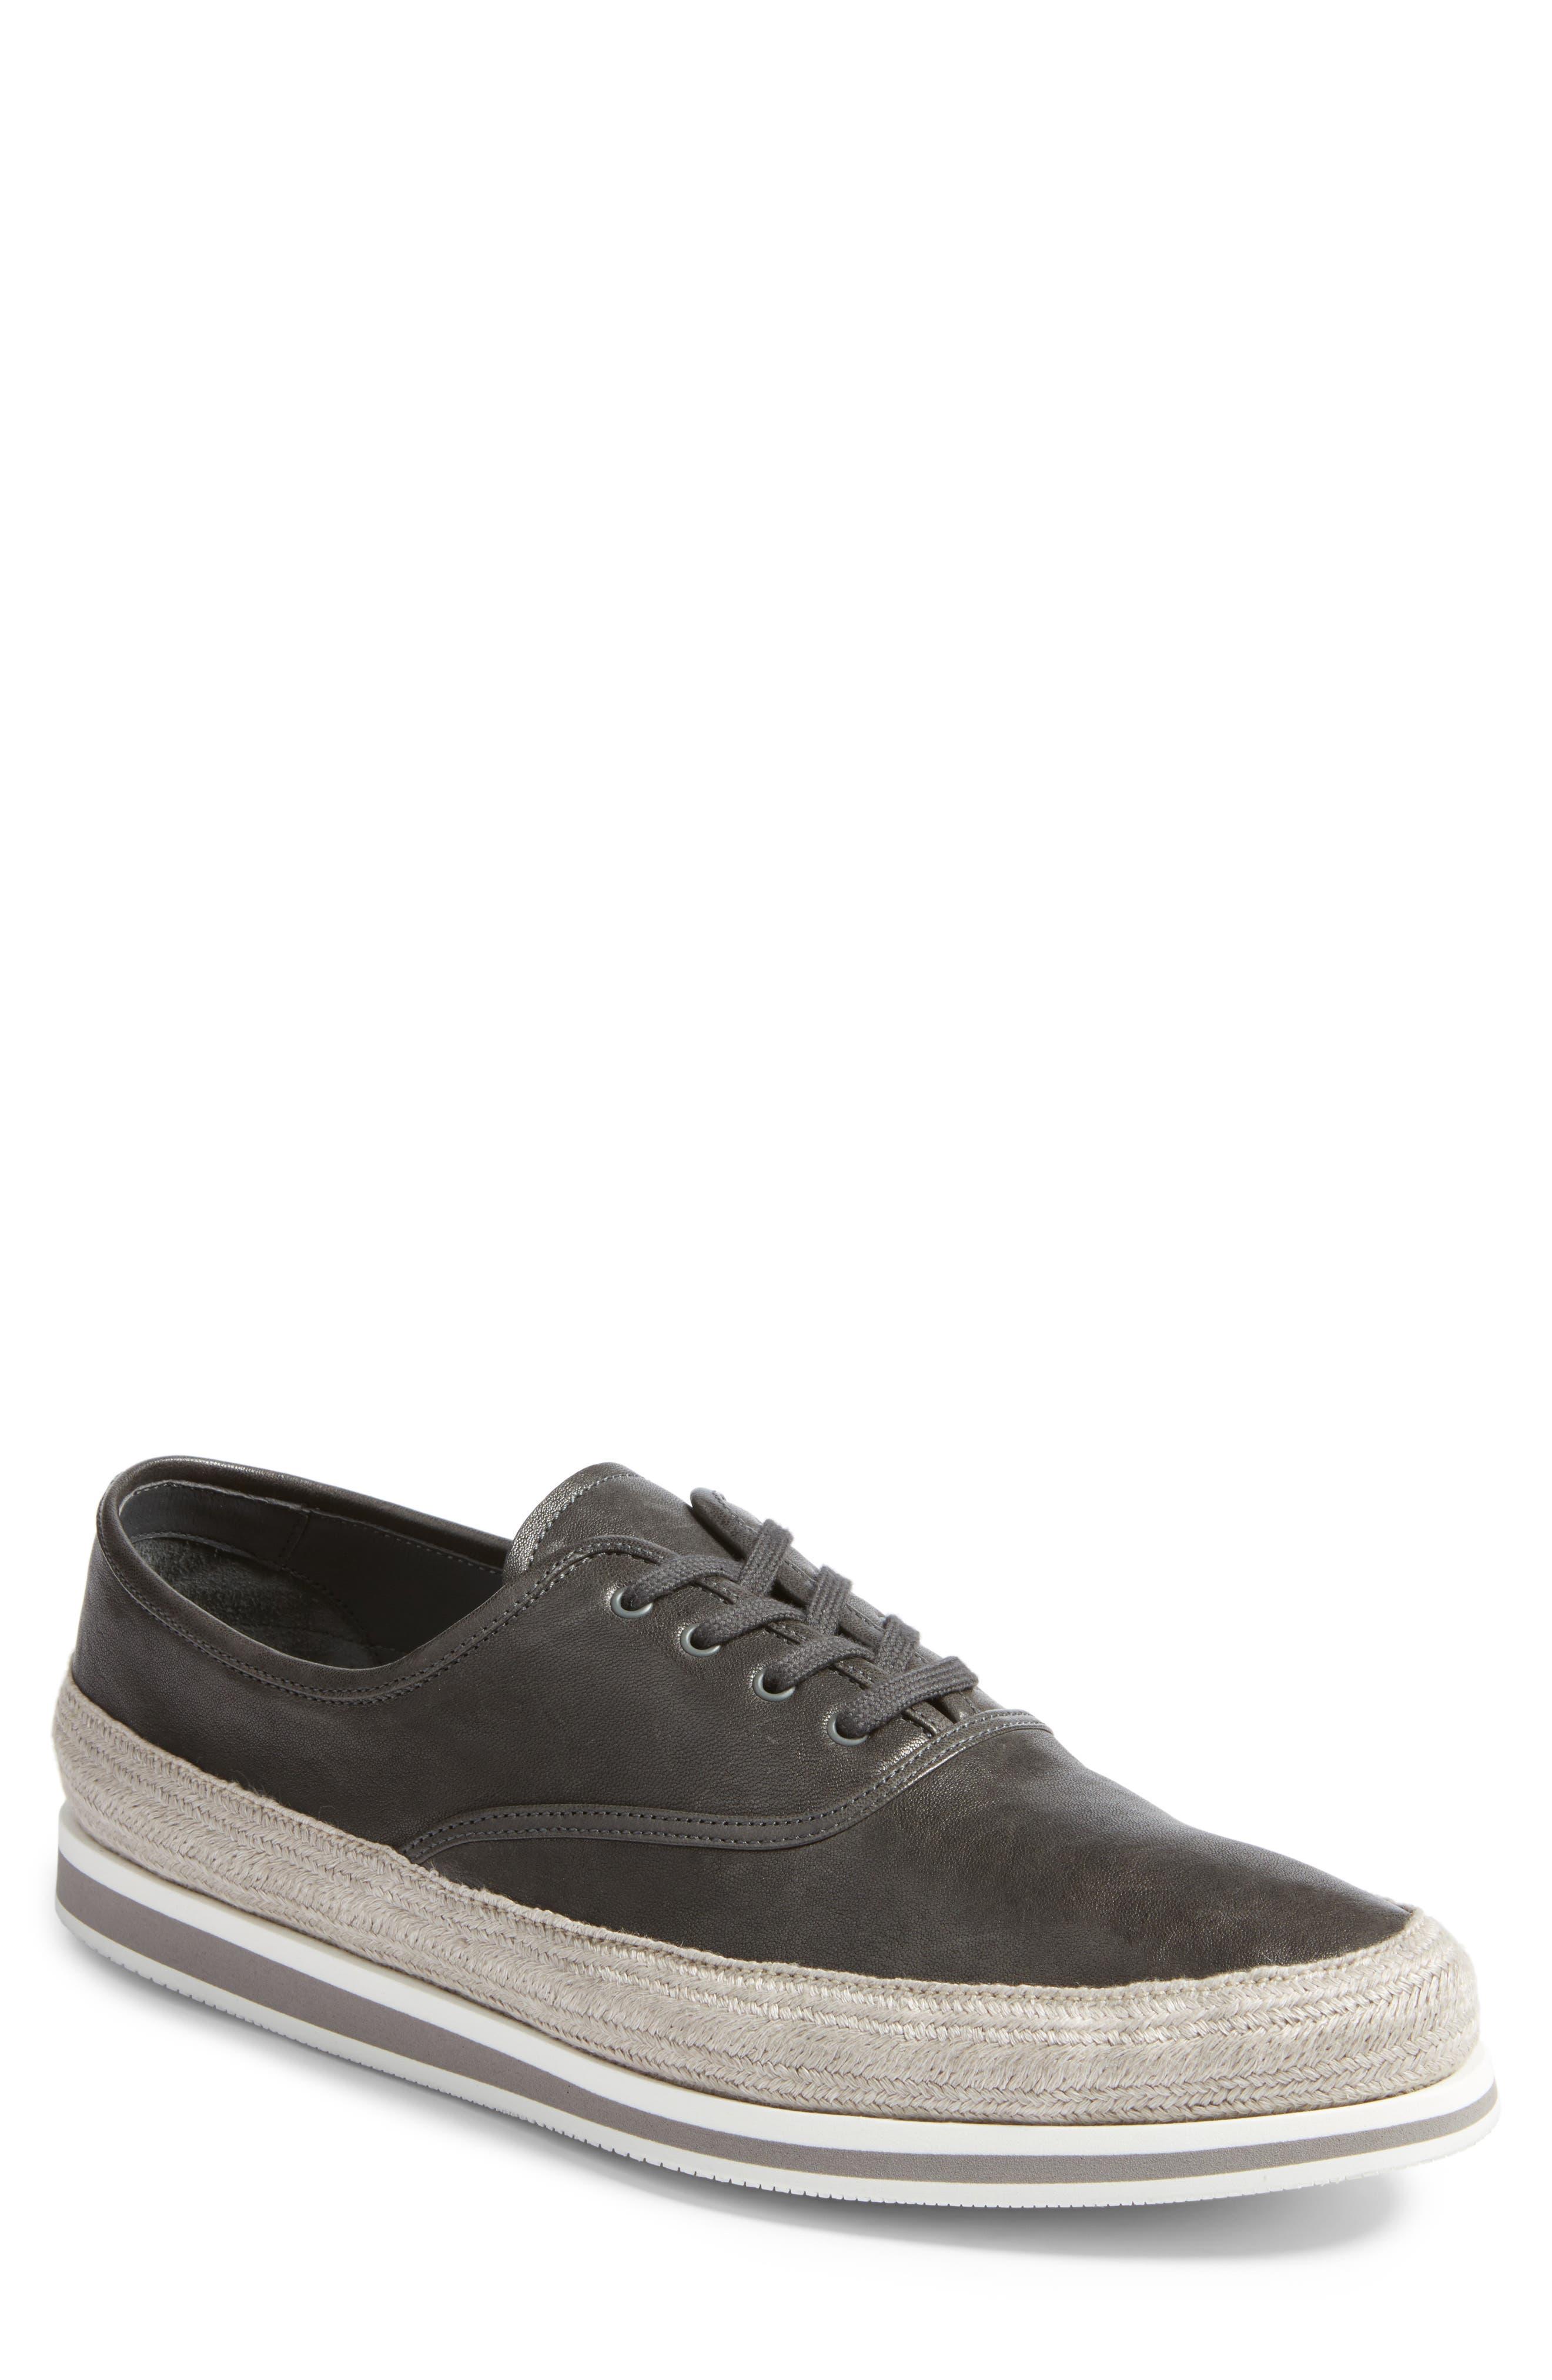 Prada Linea Rossa Espadrille Sneaker (Men)